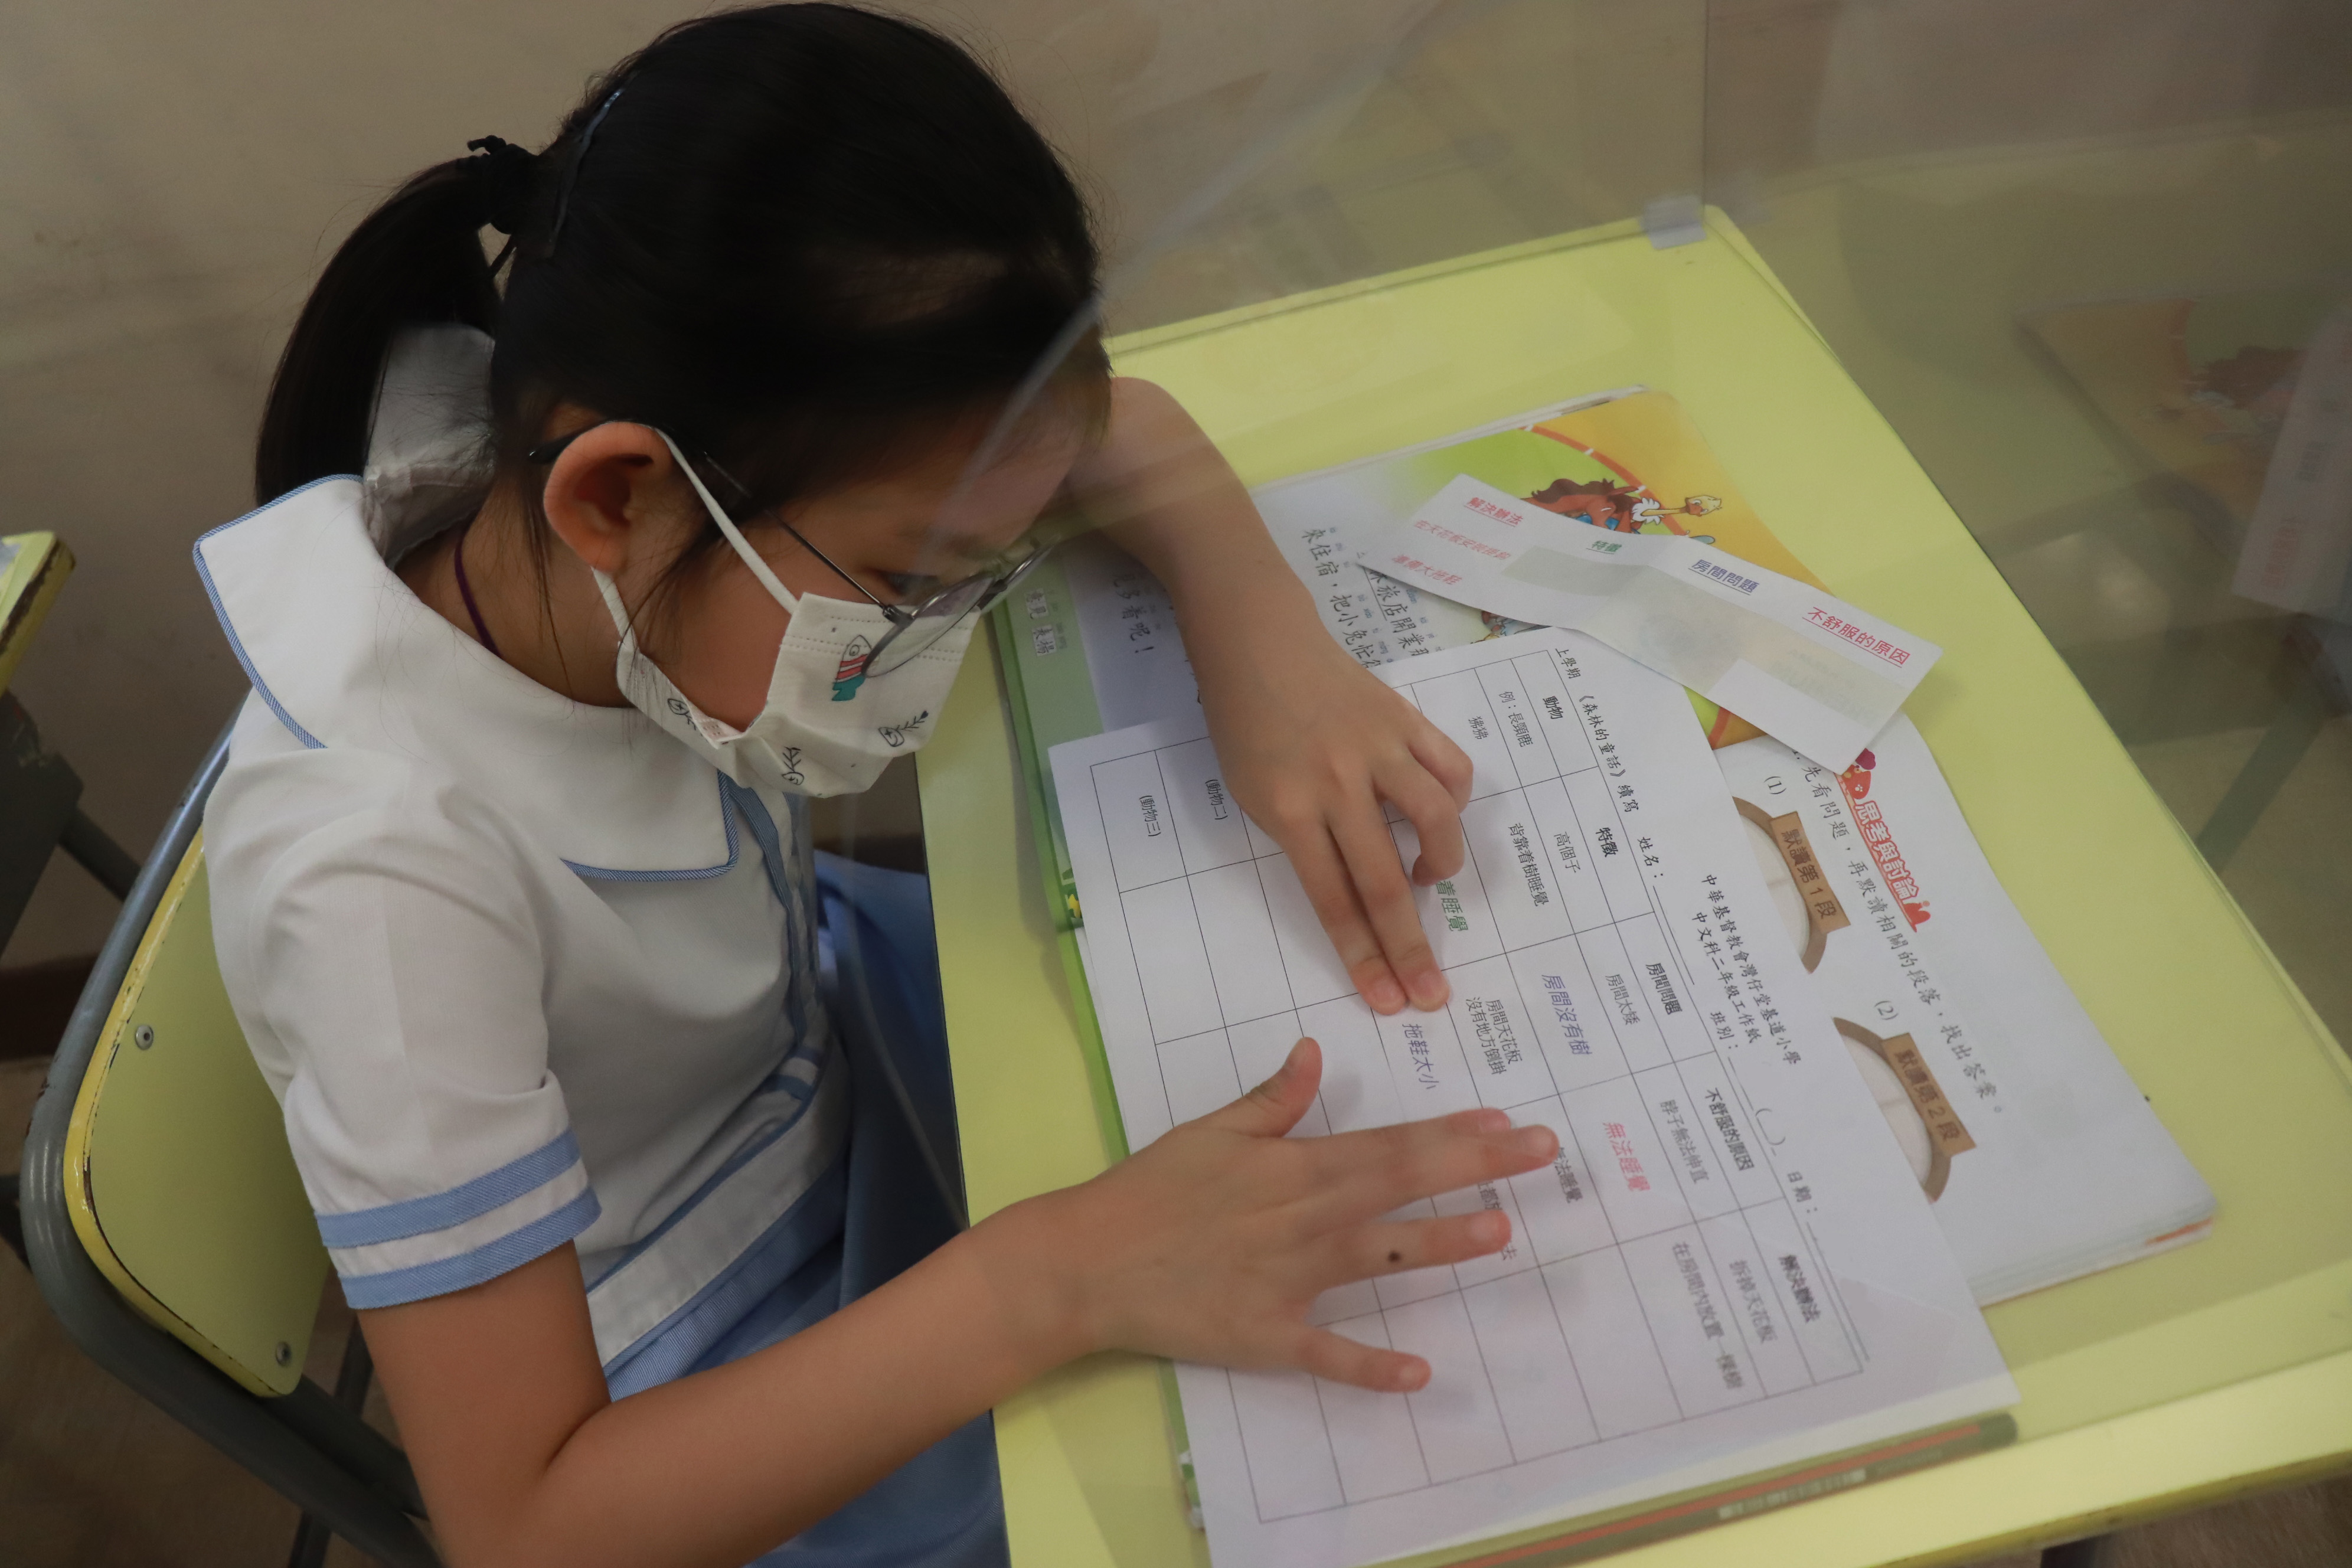 http://keito.school.hk/sites/default/files/img_65251.jpg